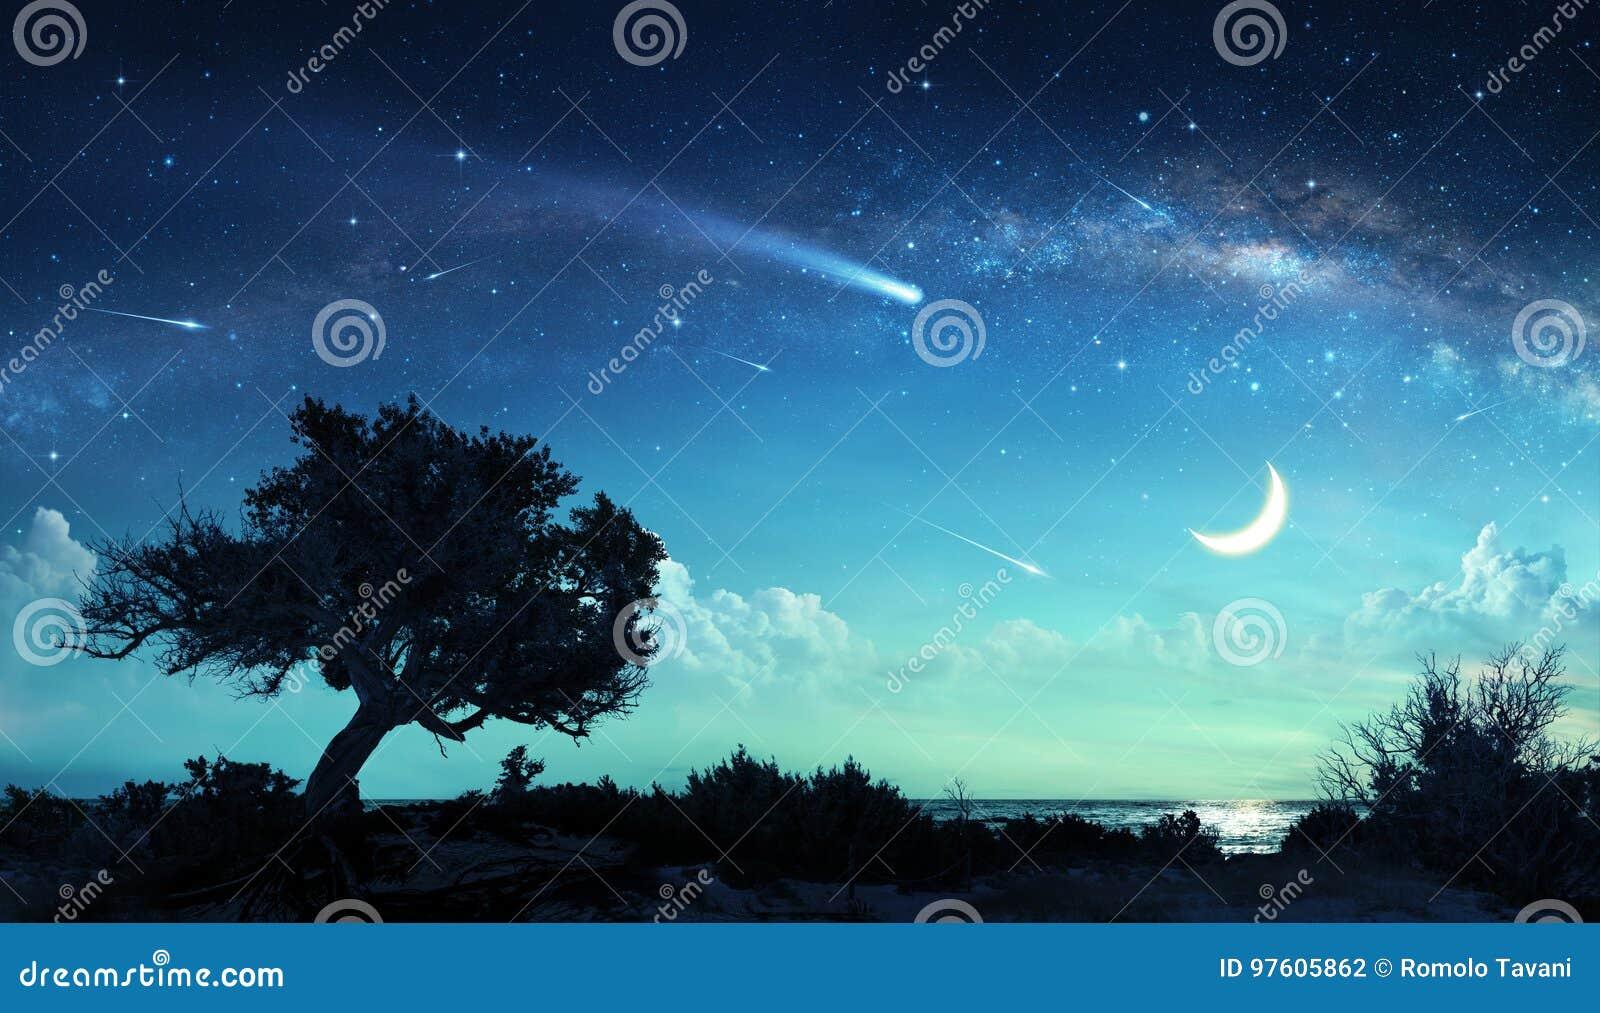 Shooting Stars In Fantasy Landscape